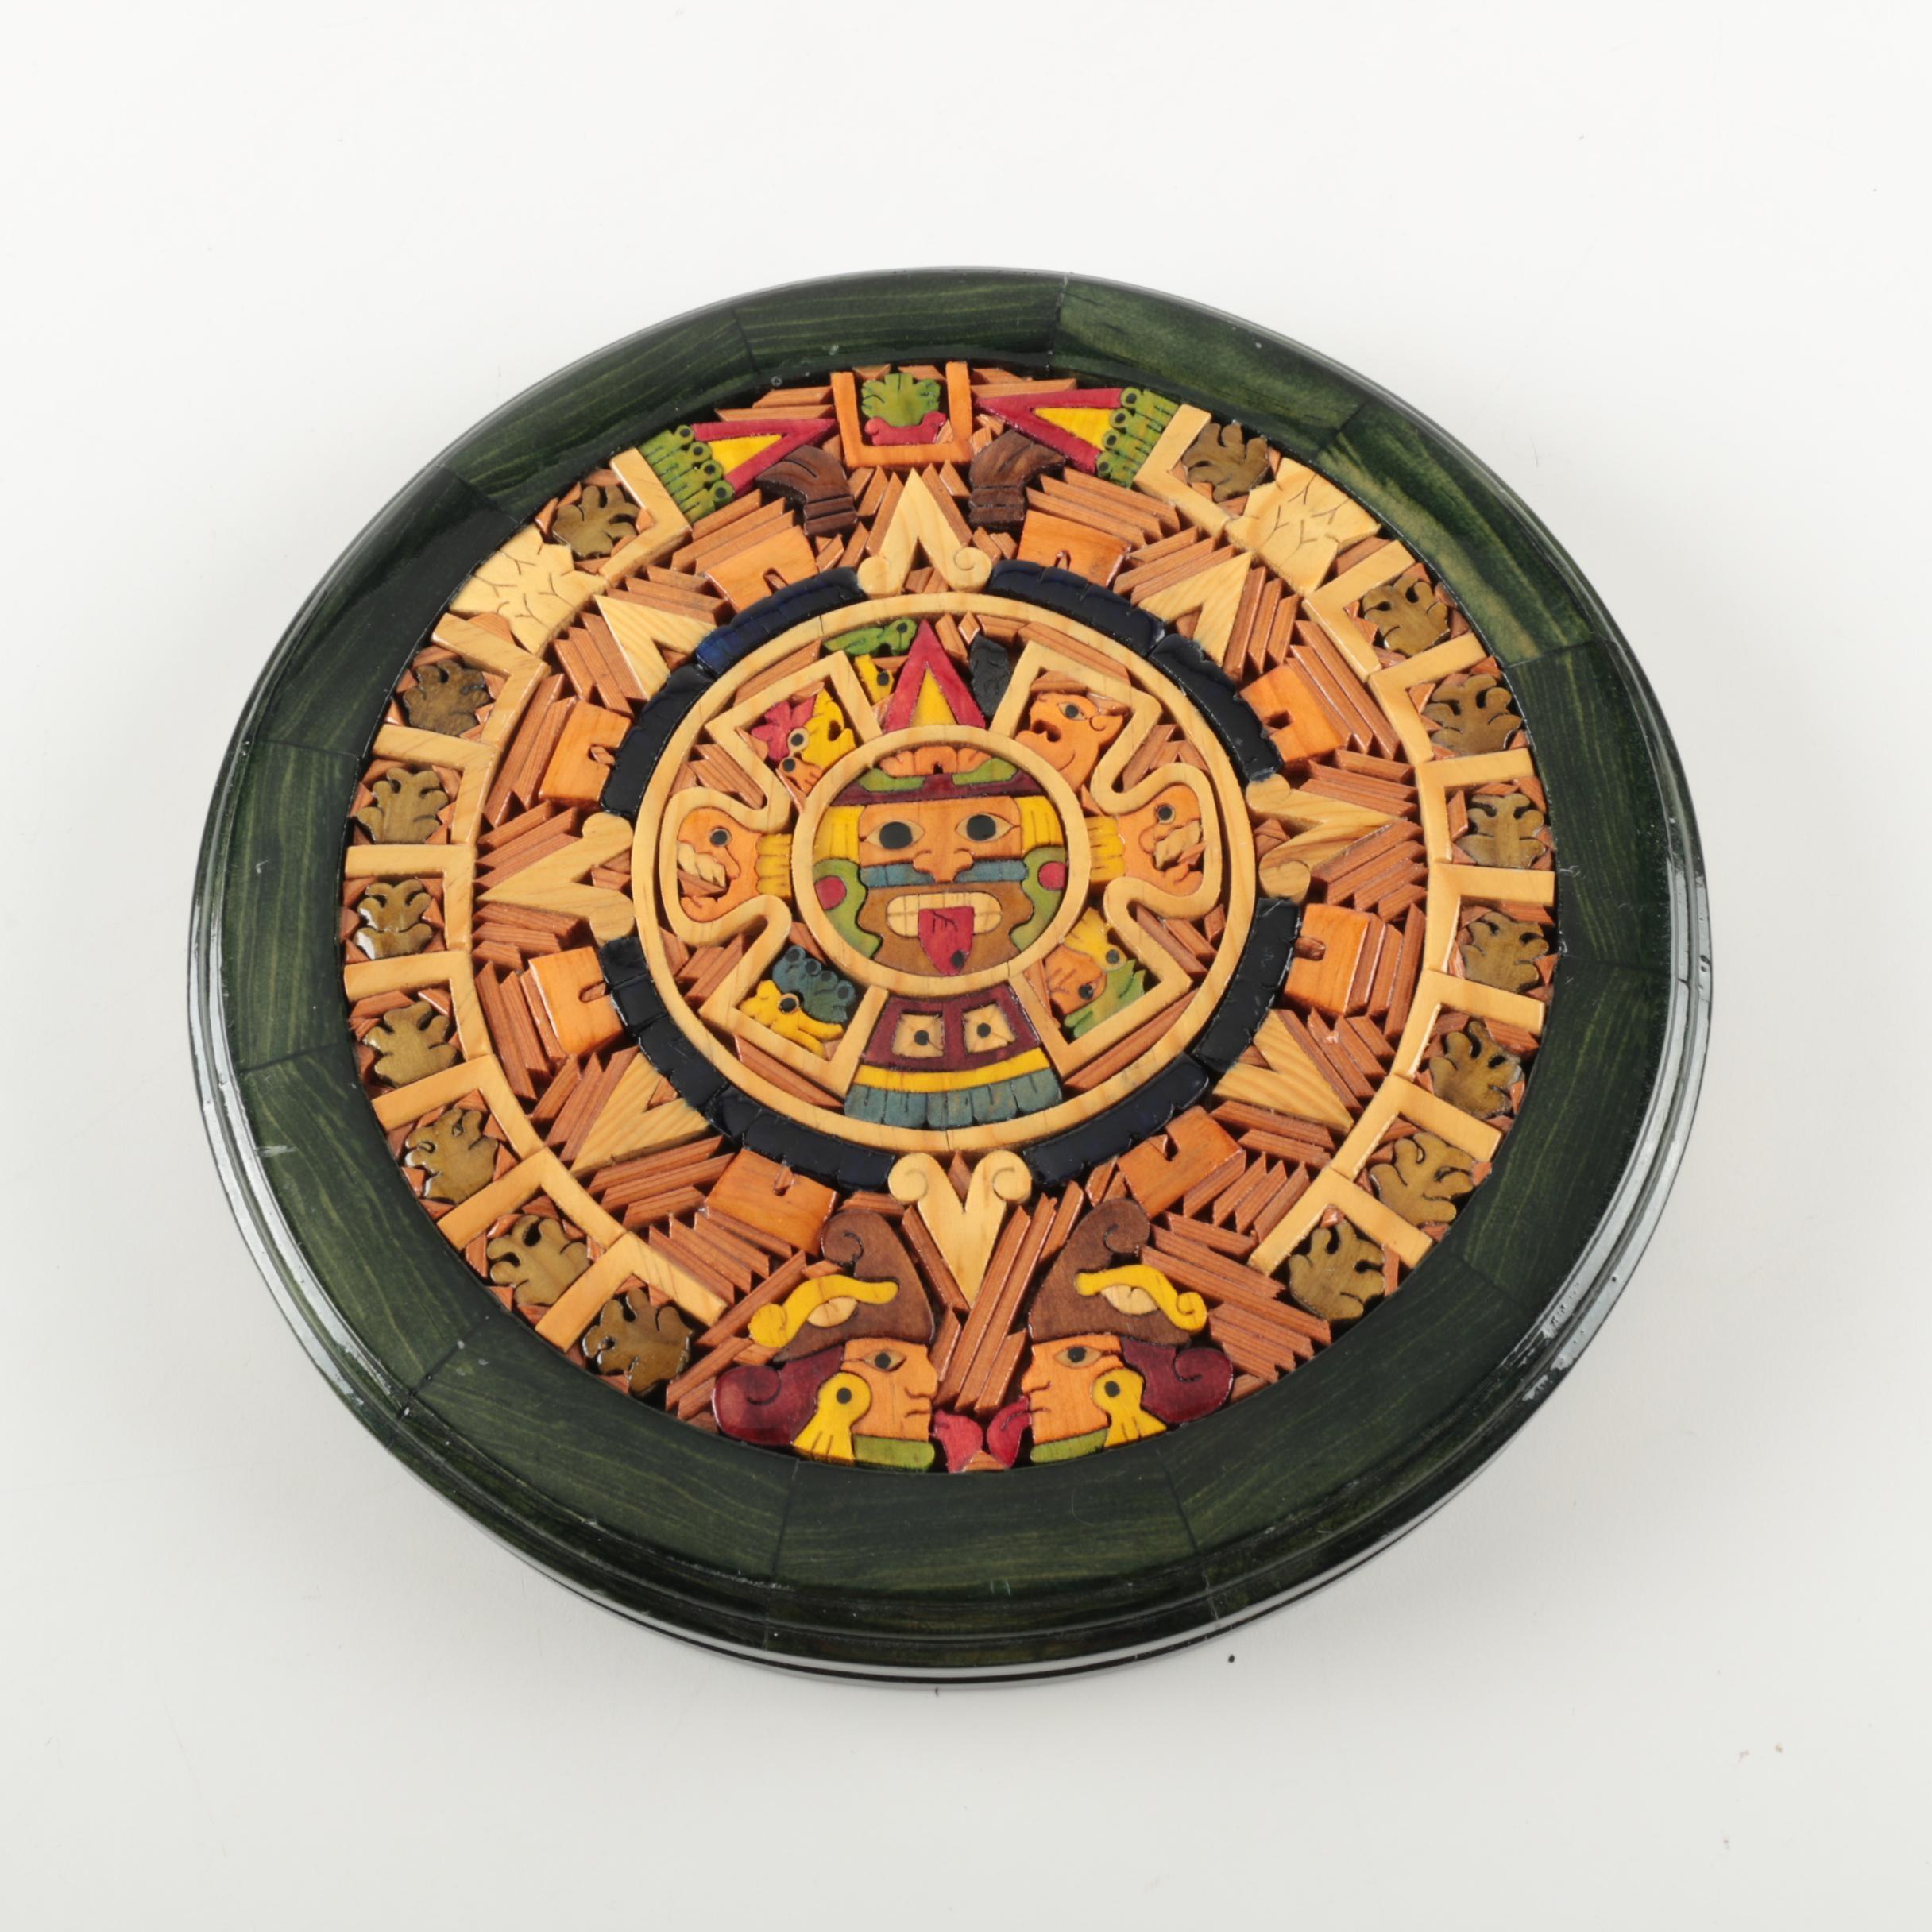 Painted Wood Aztec Calendar